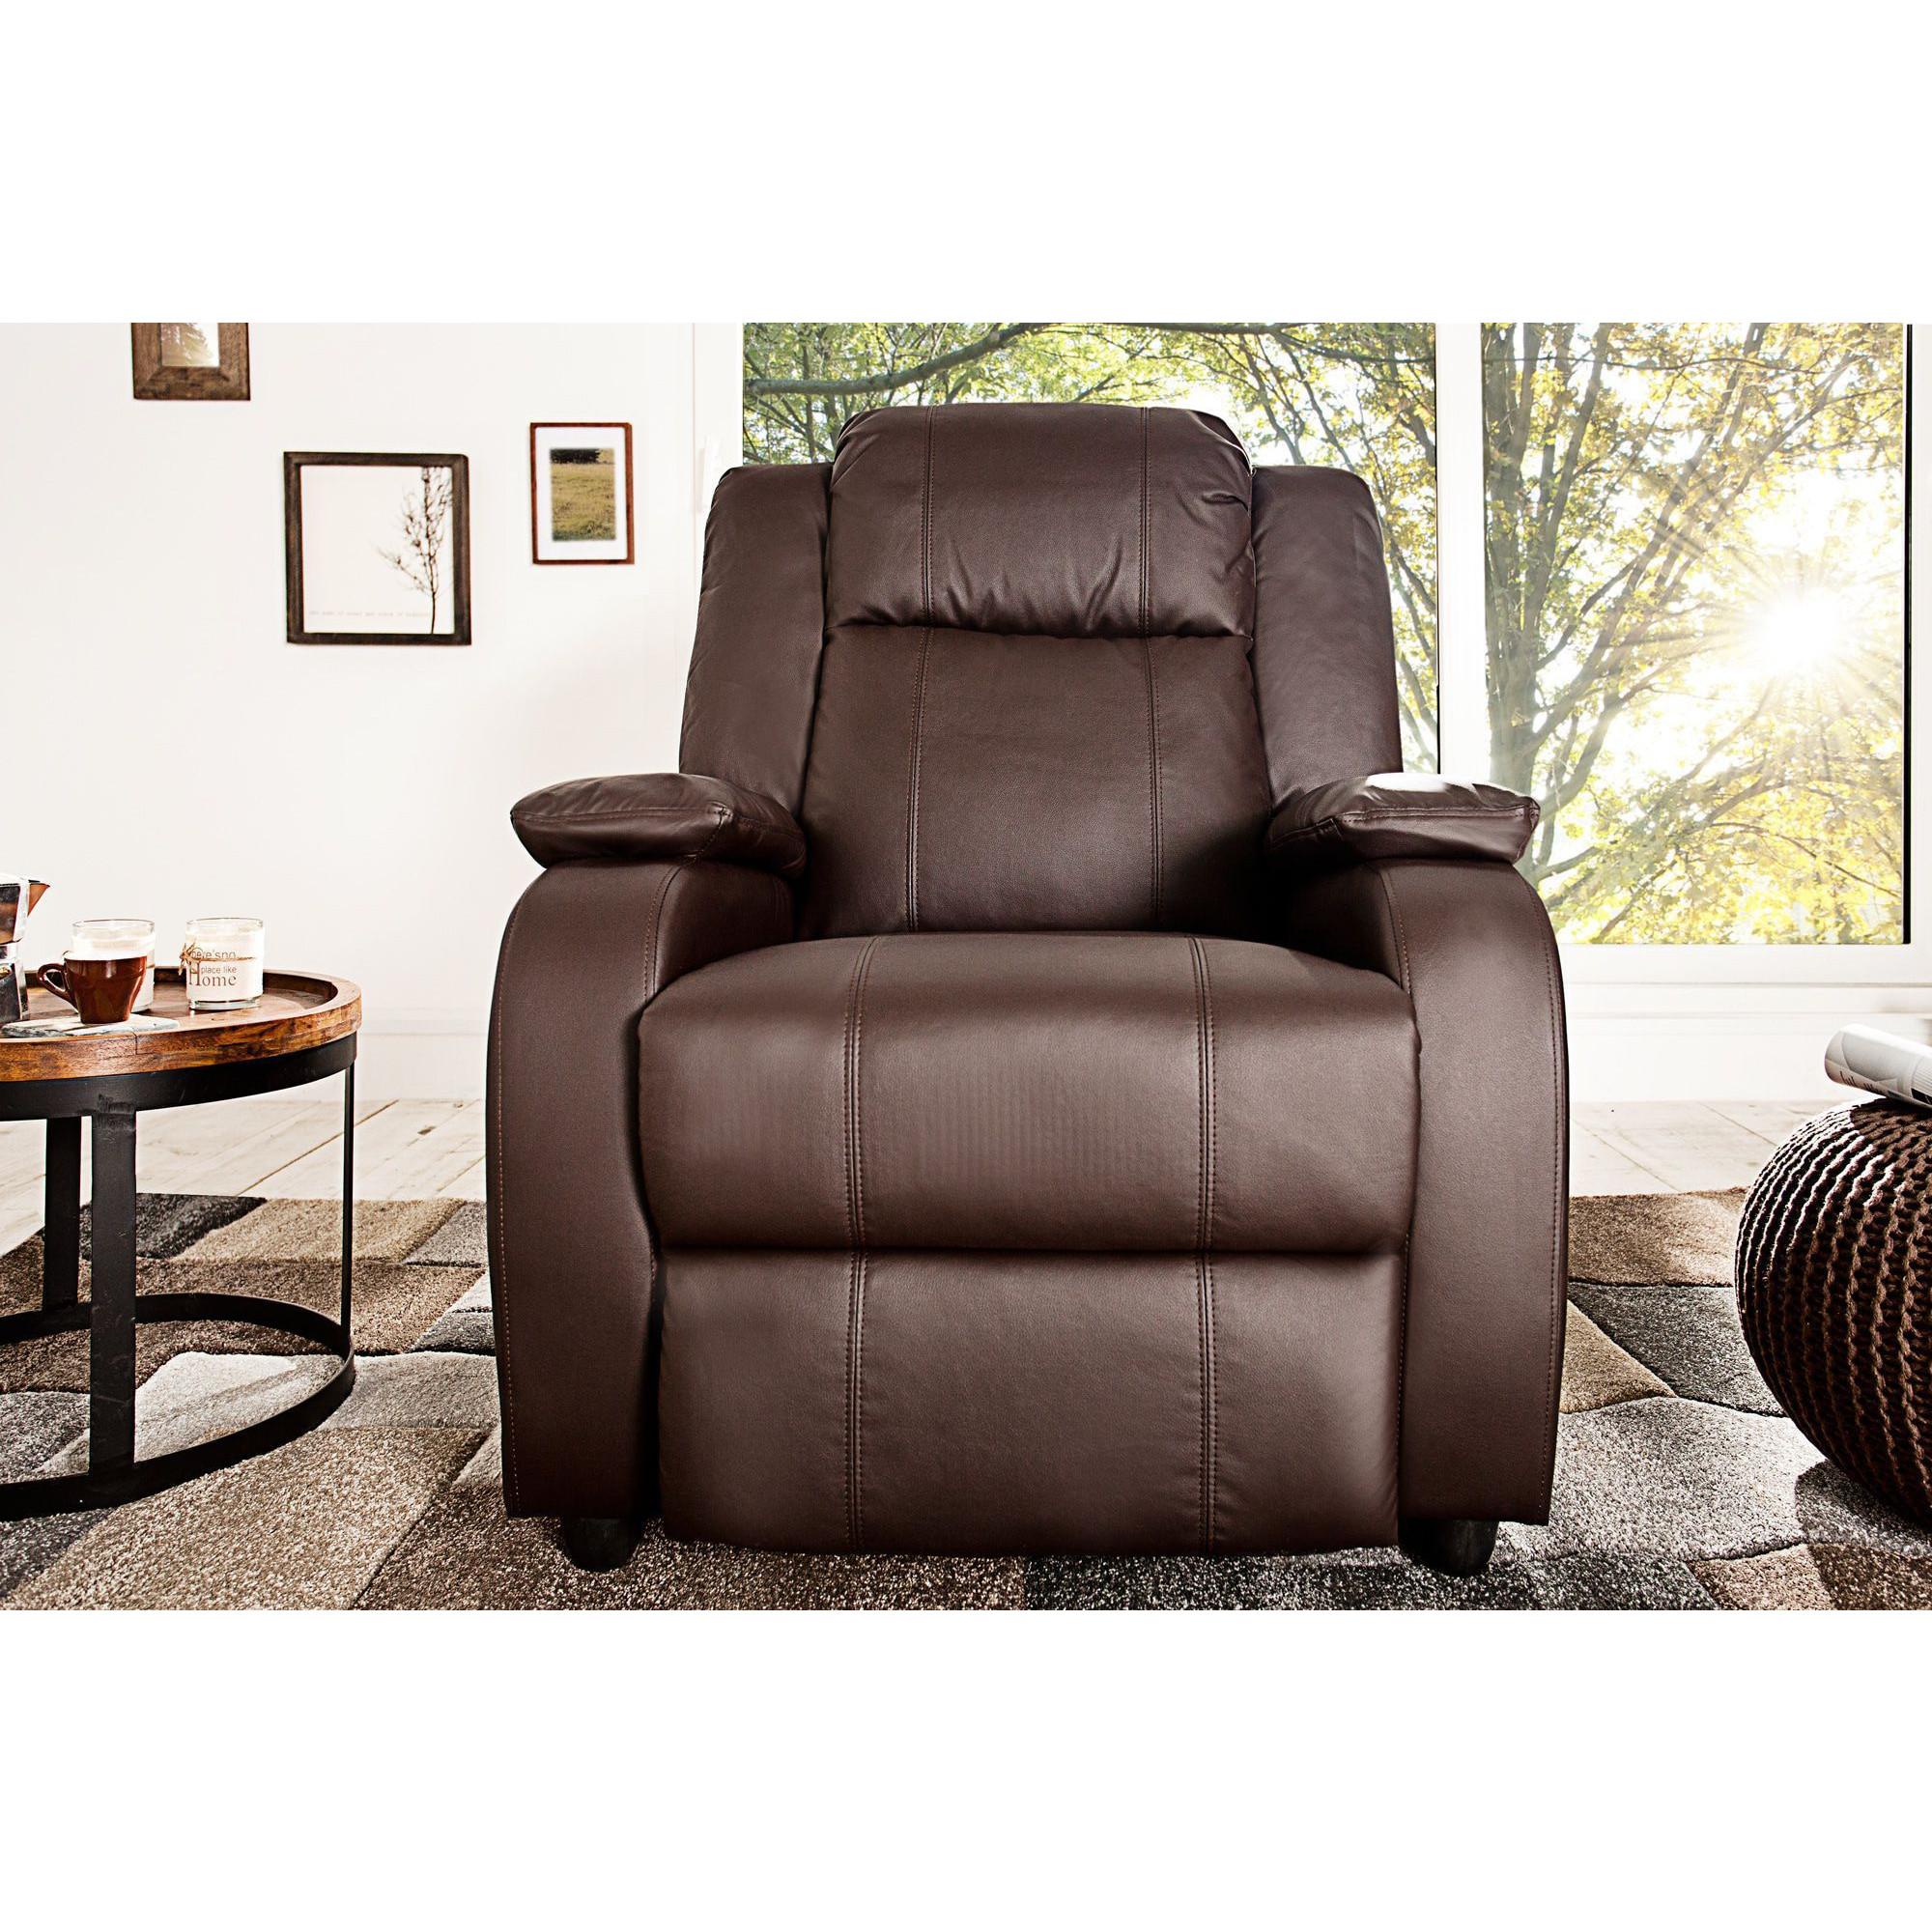 Salon Fauteuil relax design en simili cuir coloris brun